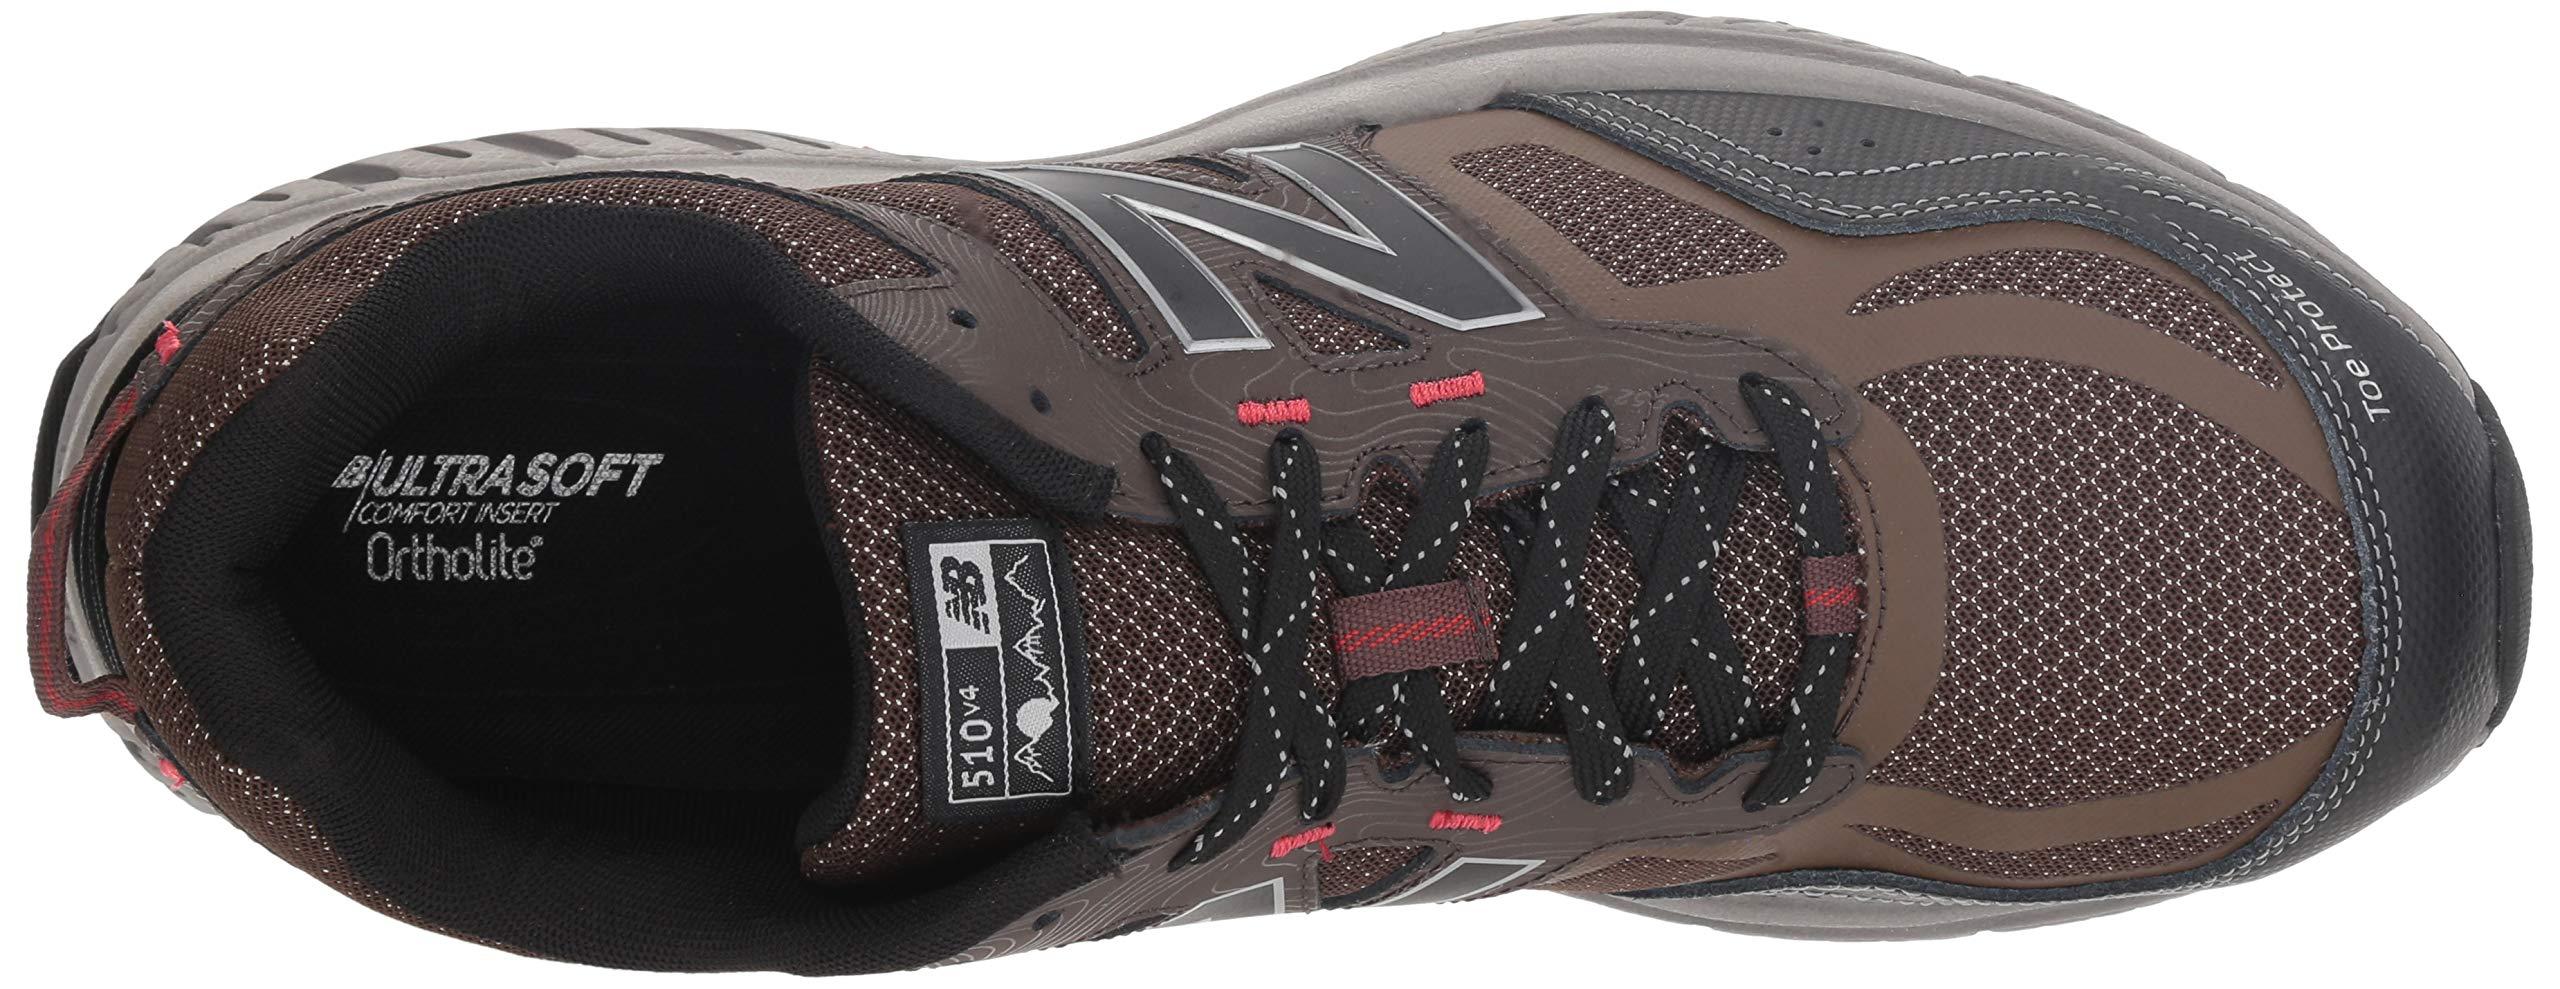 New Balance Men's 510v4 Cushioning Trail Running Shoe, Chocolate/Black/Team red, 7 D US by New Balance (Image #8)